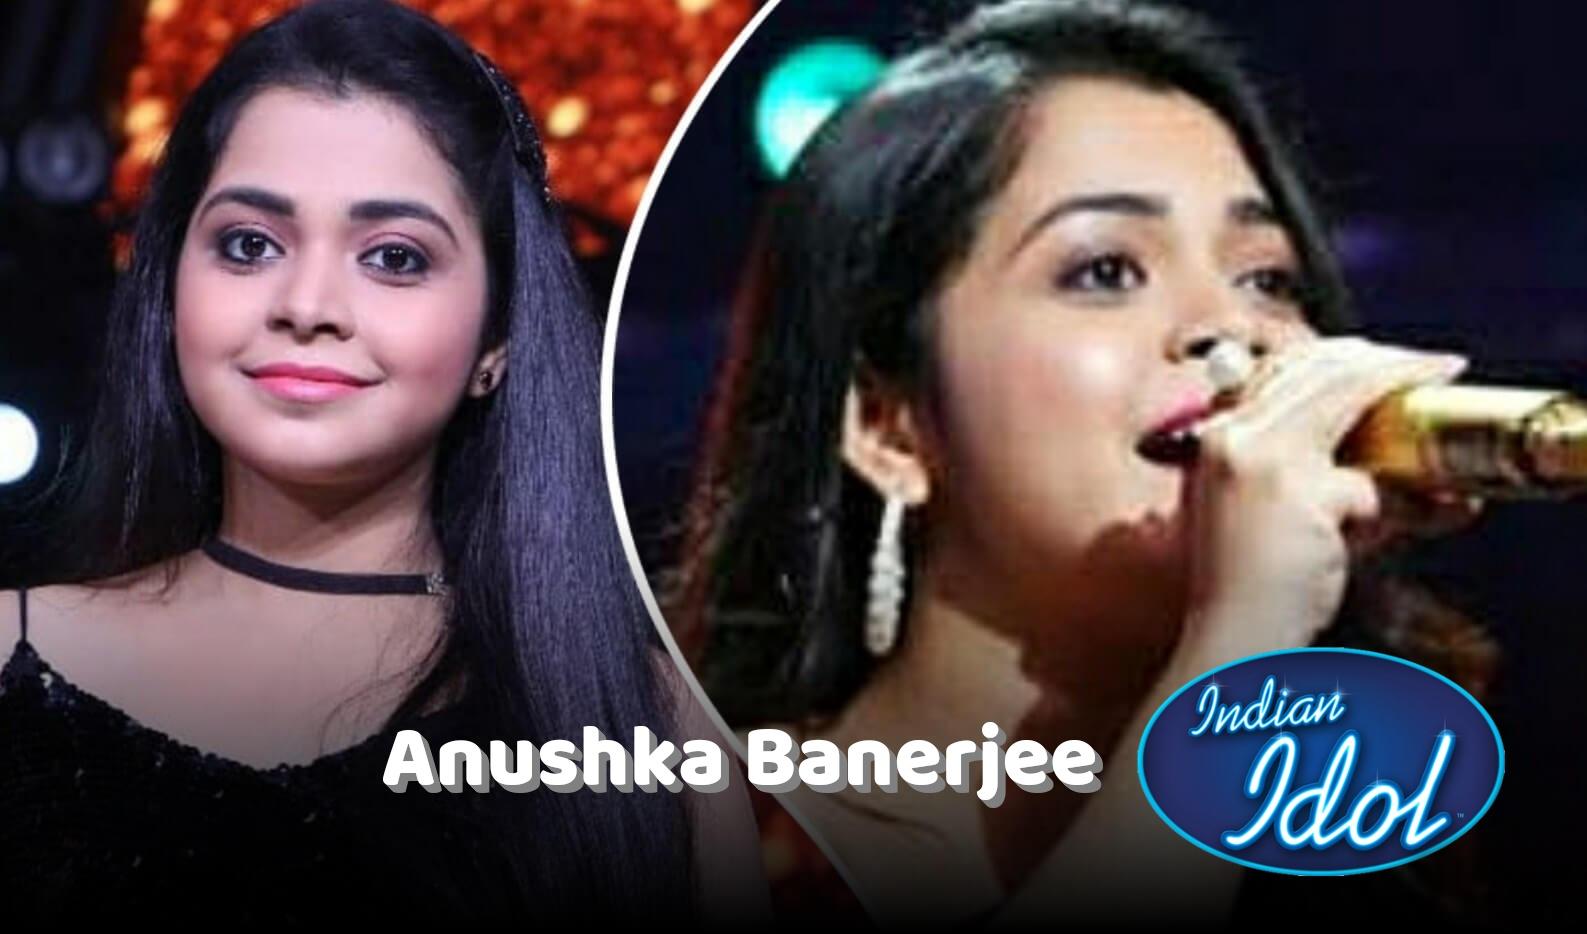 Anushka-Banerjee-Indian-Idol-2020-Contestant-Wiki-Age-Bio-Hometown-Season-12